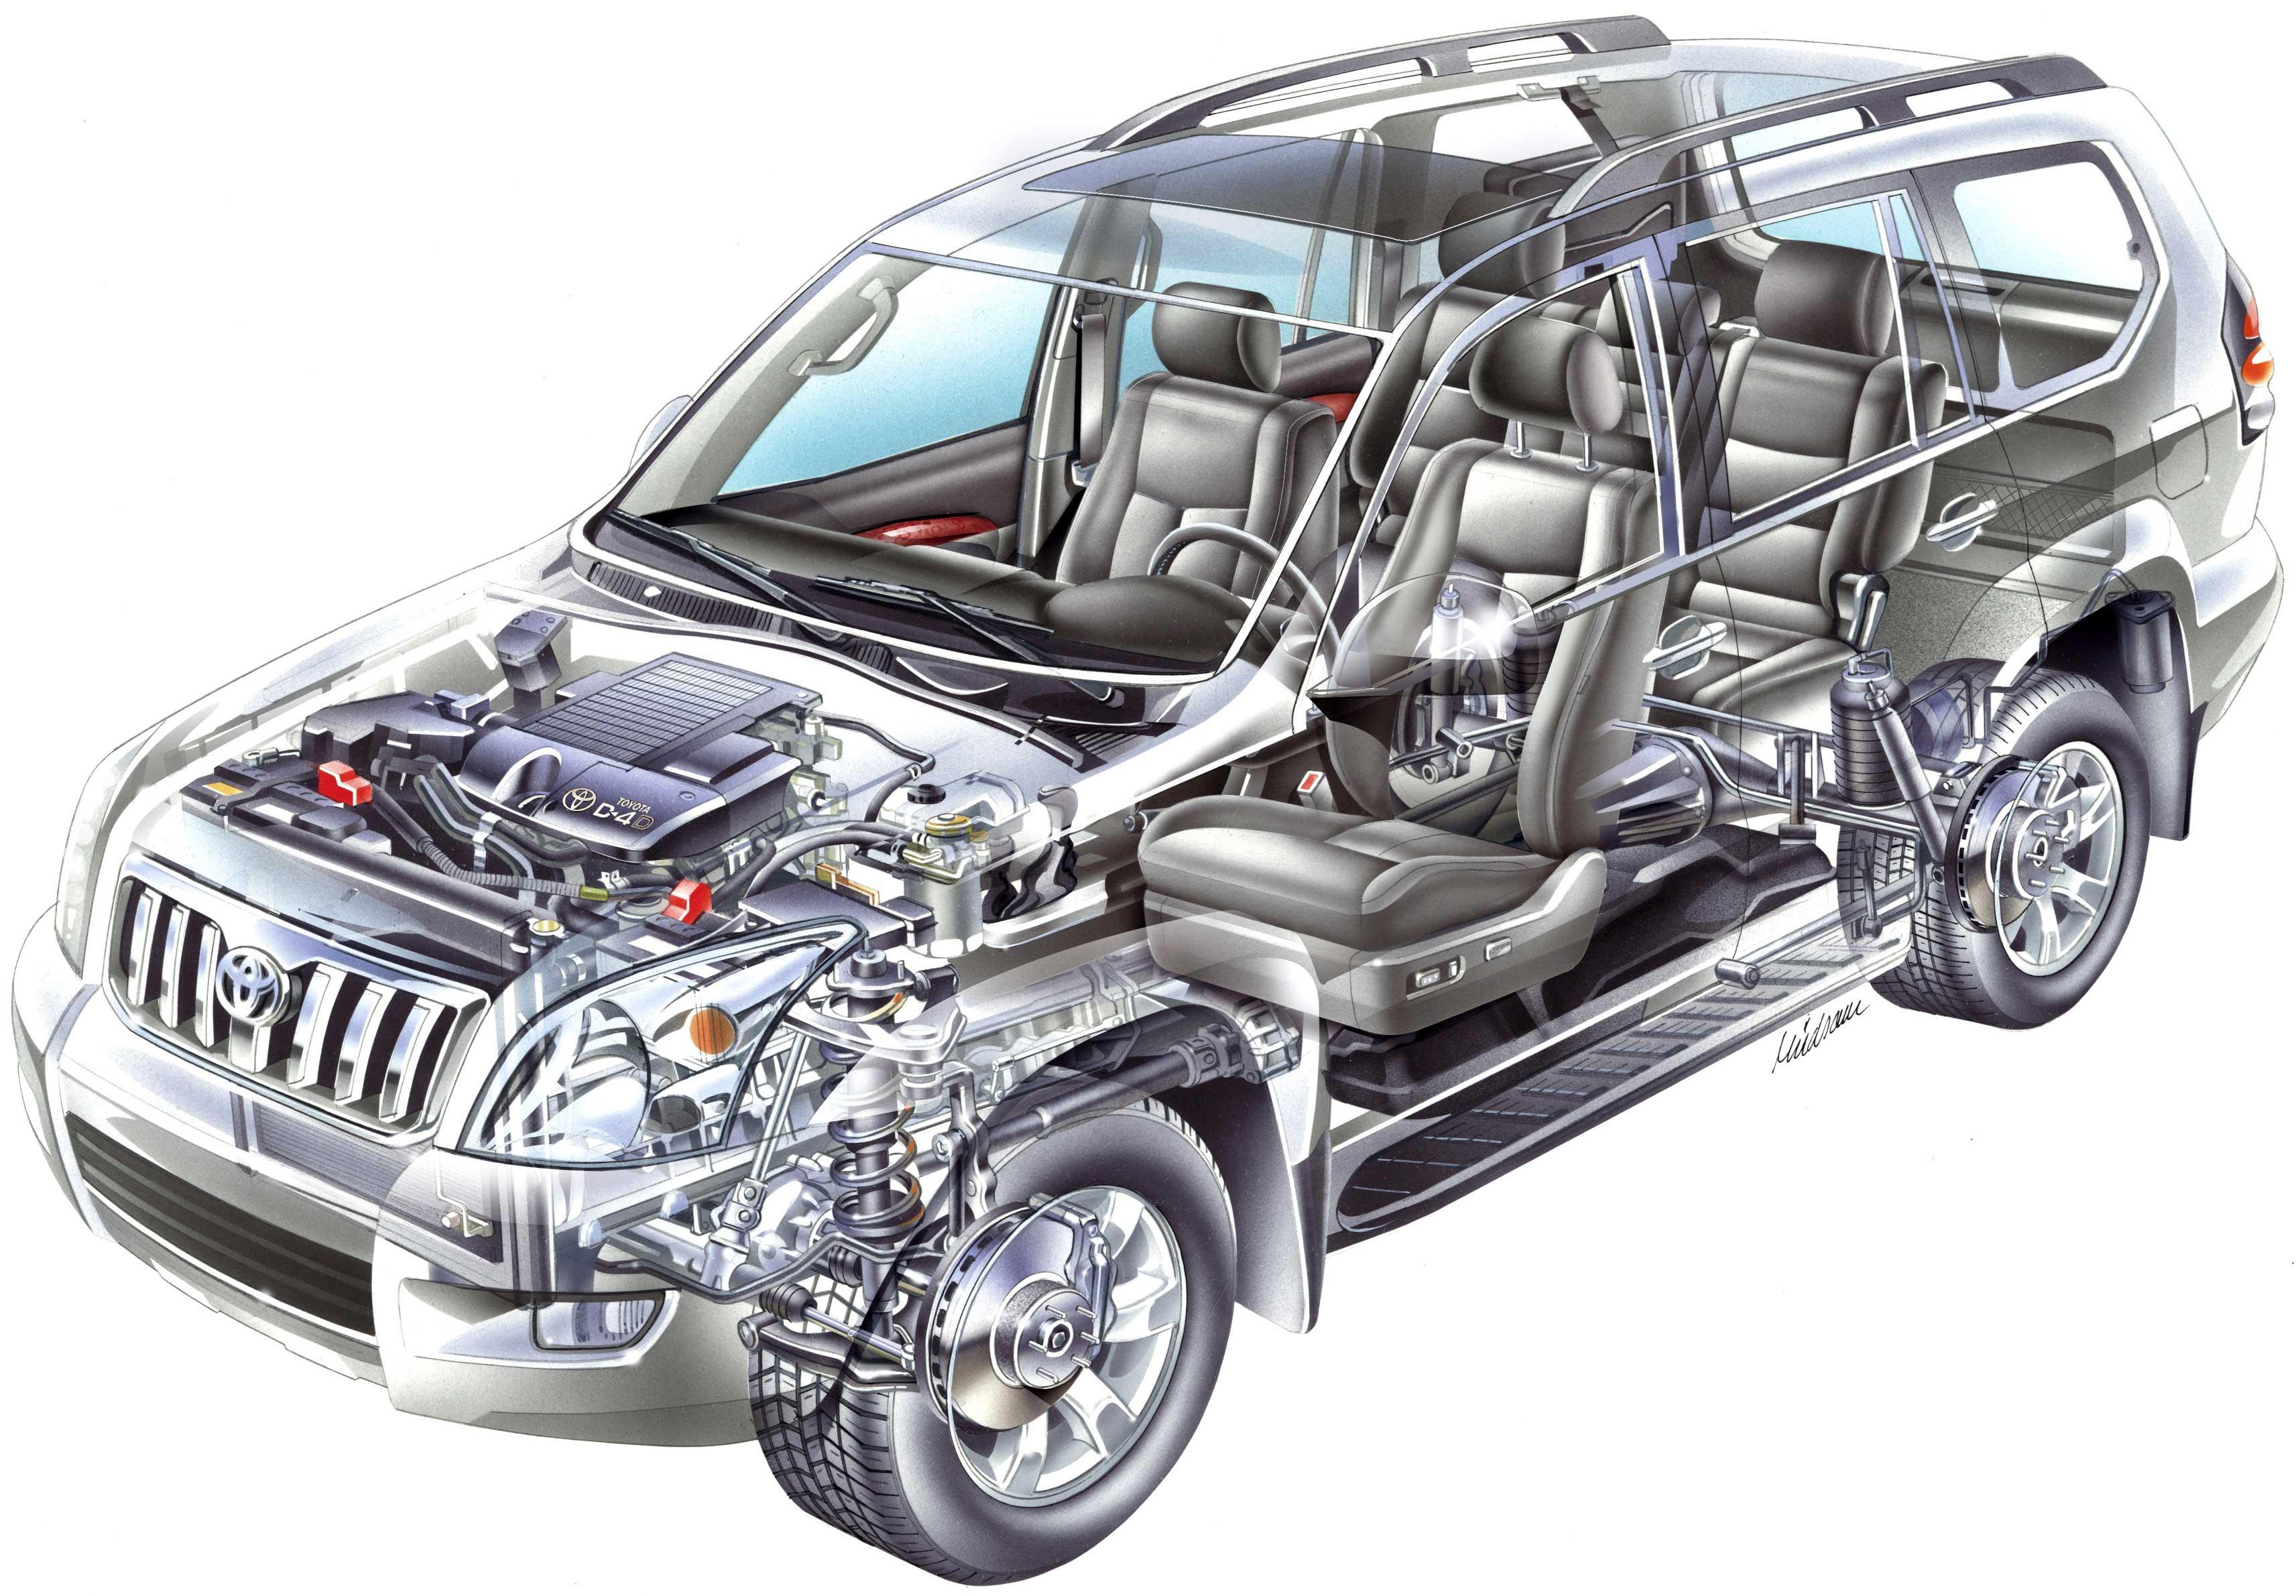 Toyota Land Cruiser cutaway